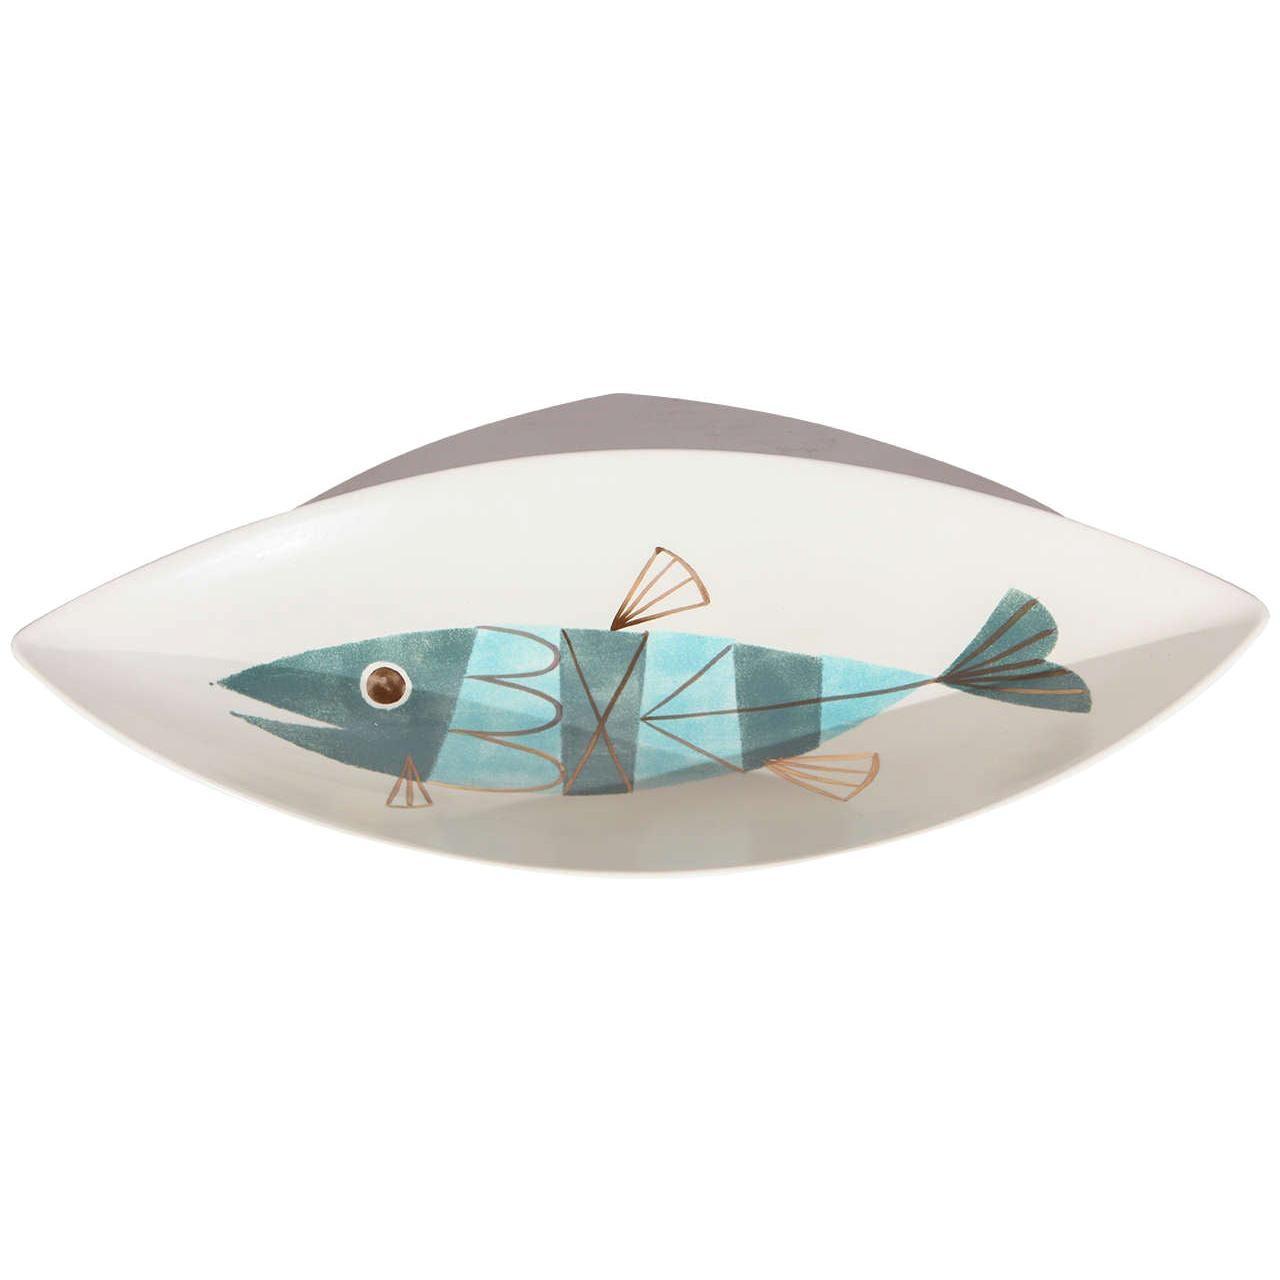 Large Metlox Fish Centerpiece Bowl